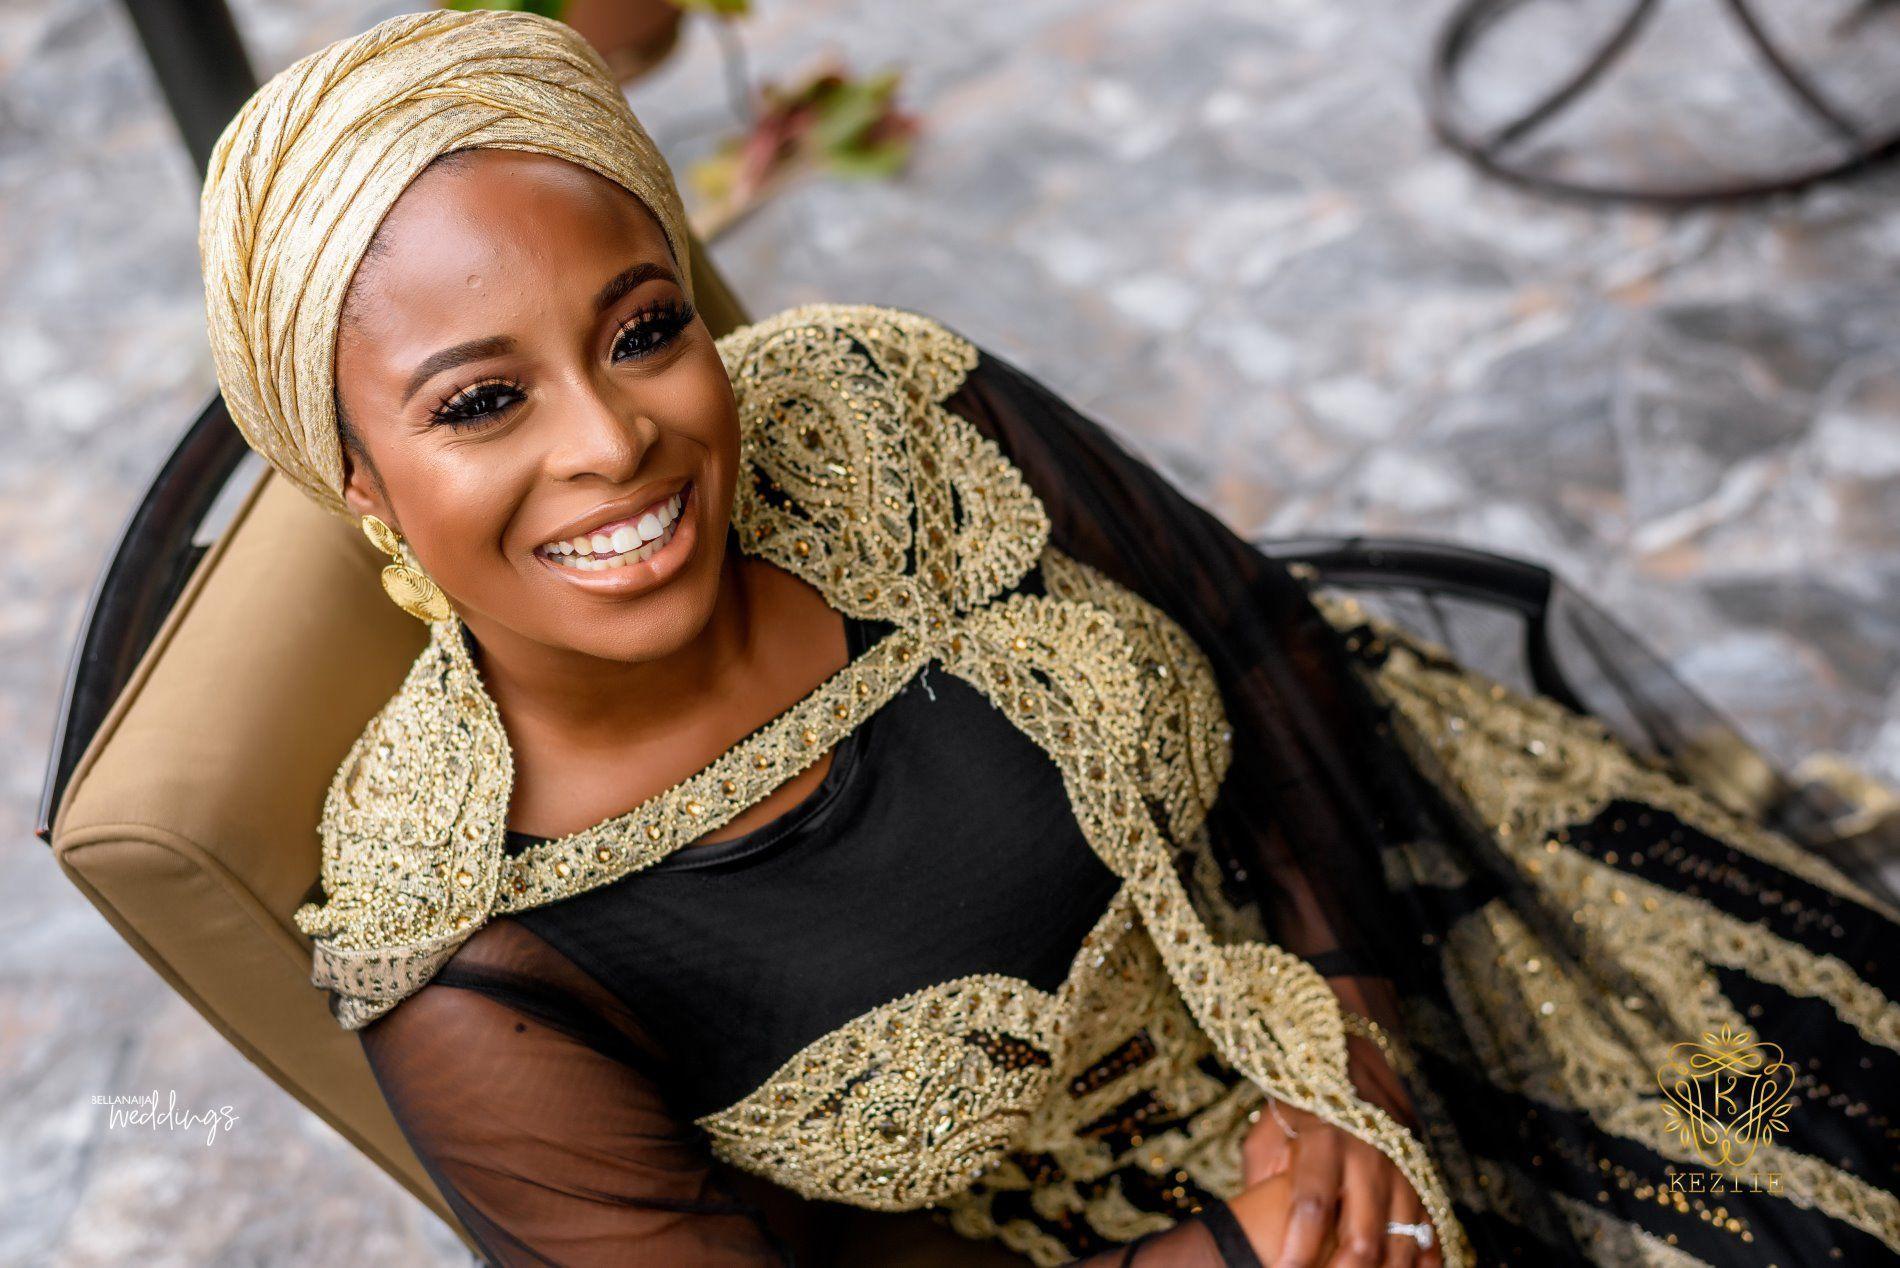 Nigerian Dresses For Nigerian Brides, A Fashion Queen, Portrait photography